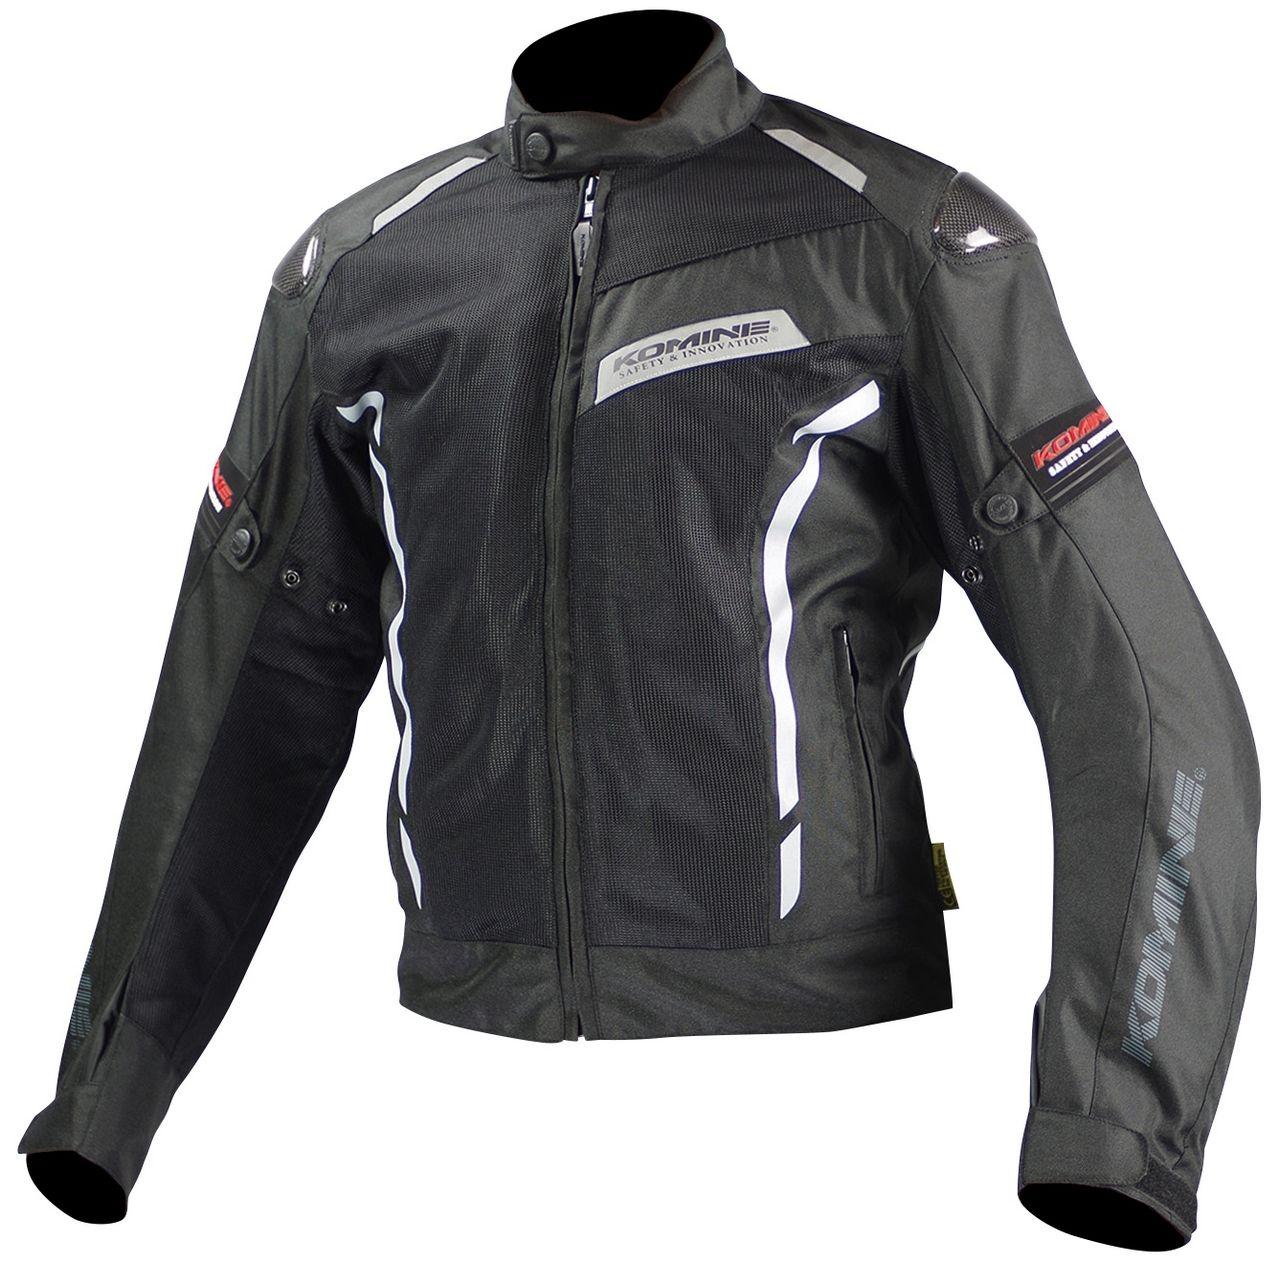 JK-103 Carbon Protect Mesh Jacket